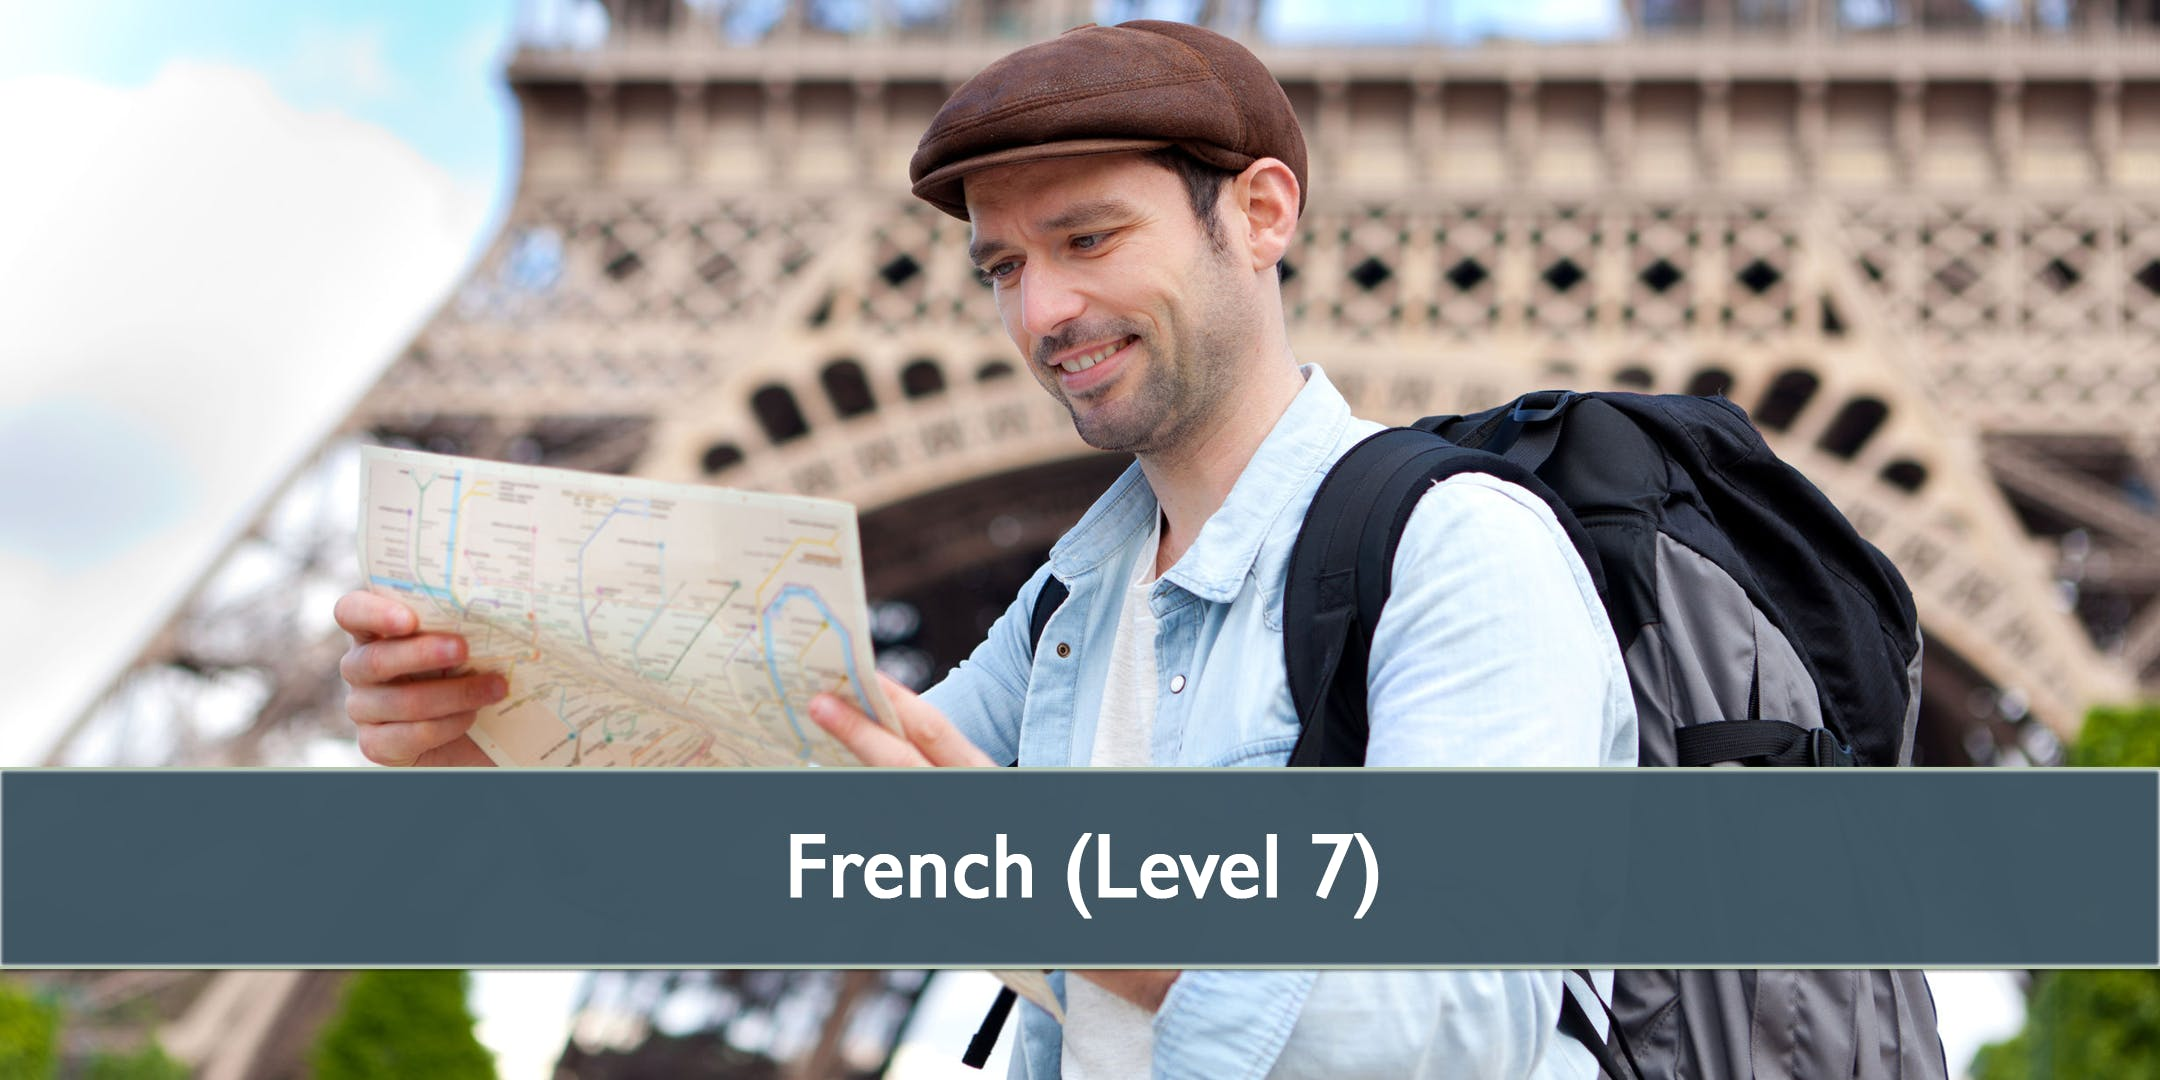 French (Level 7) - January 2019